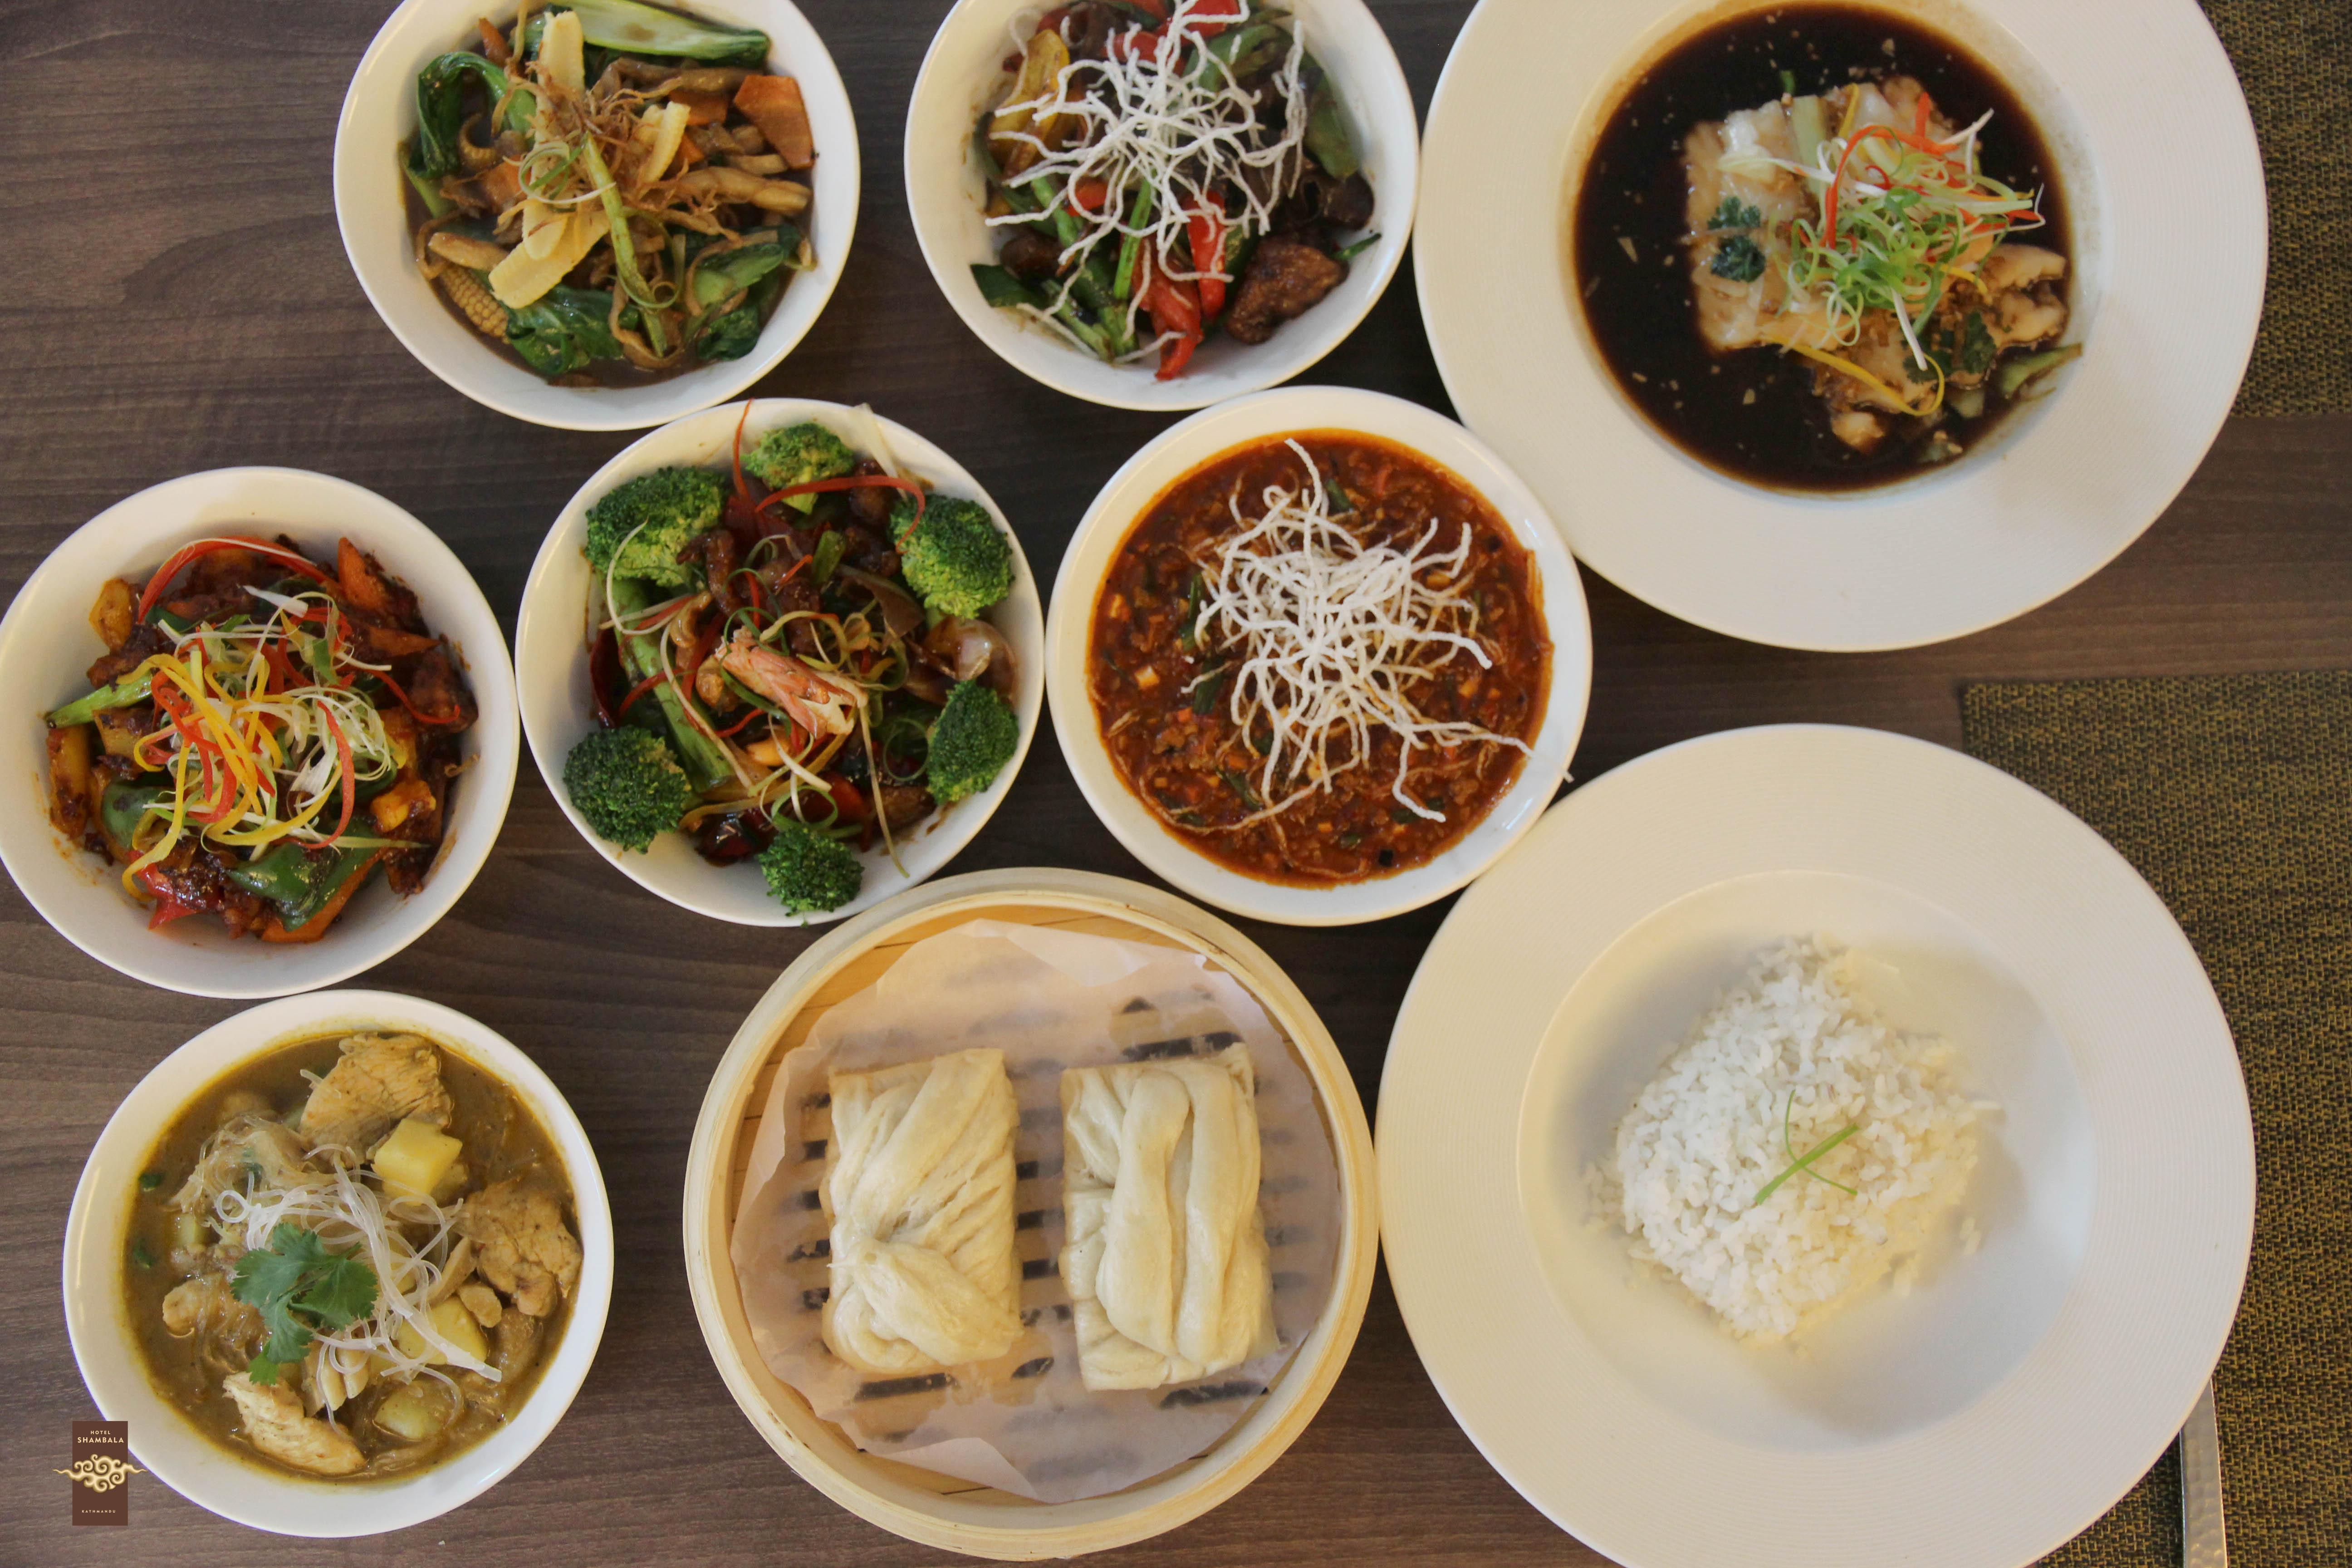 CHINESE MENU FOOD